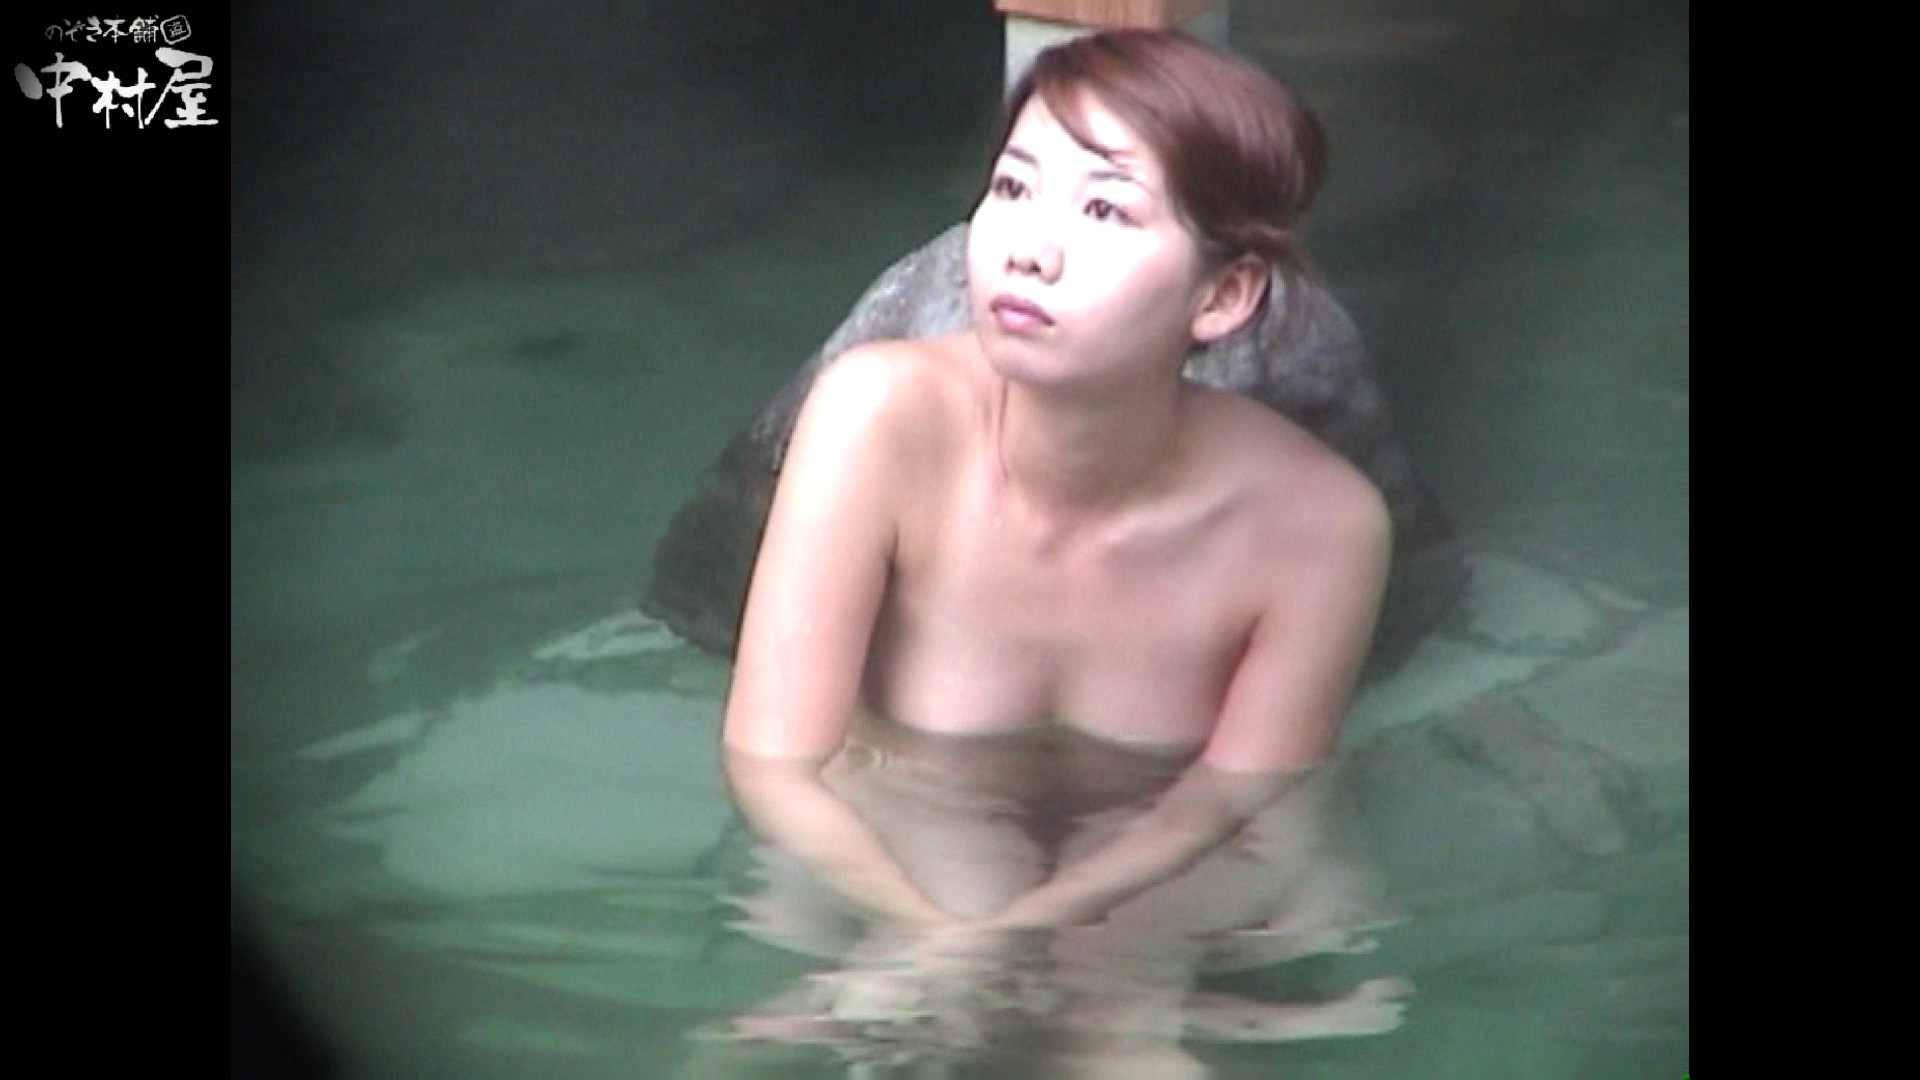 Aquaな露天風呂Vol.951 盗撮映像  93Pix 85